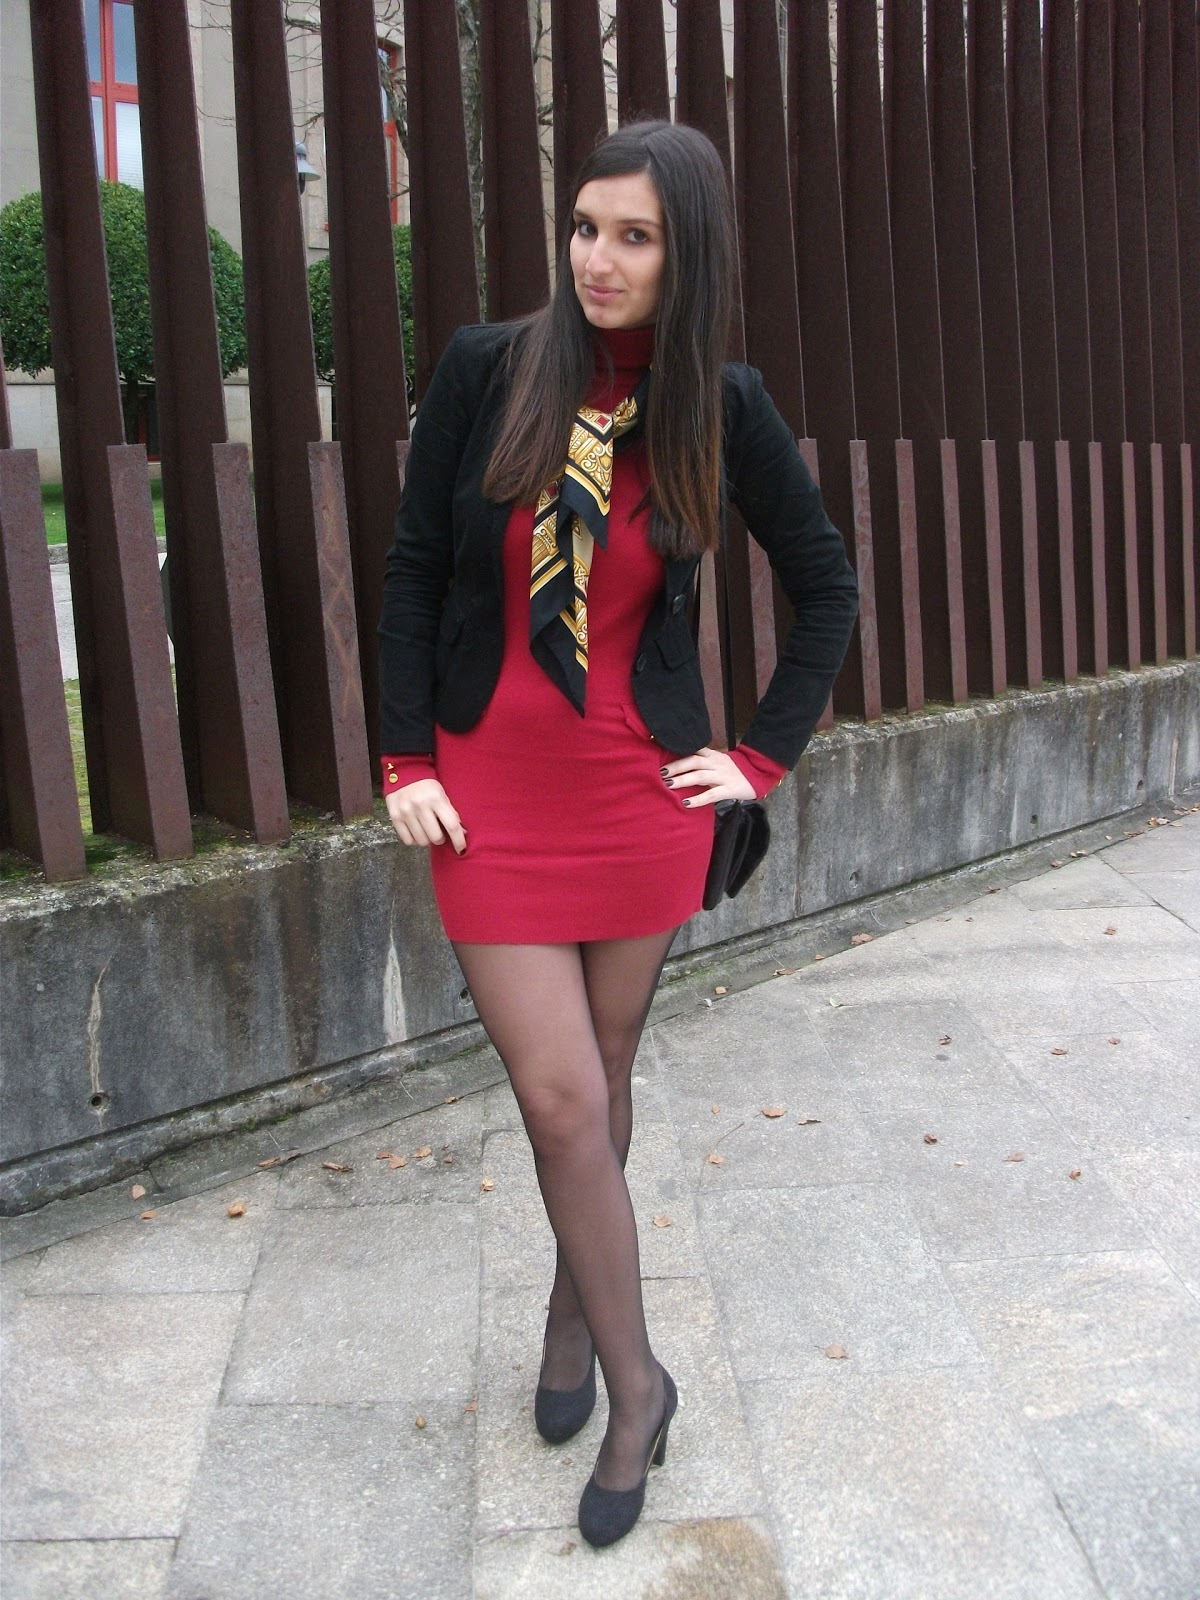 Thelongleggedstyleblogger: Fashion My Legs - The Tights And Hosiery Blog